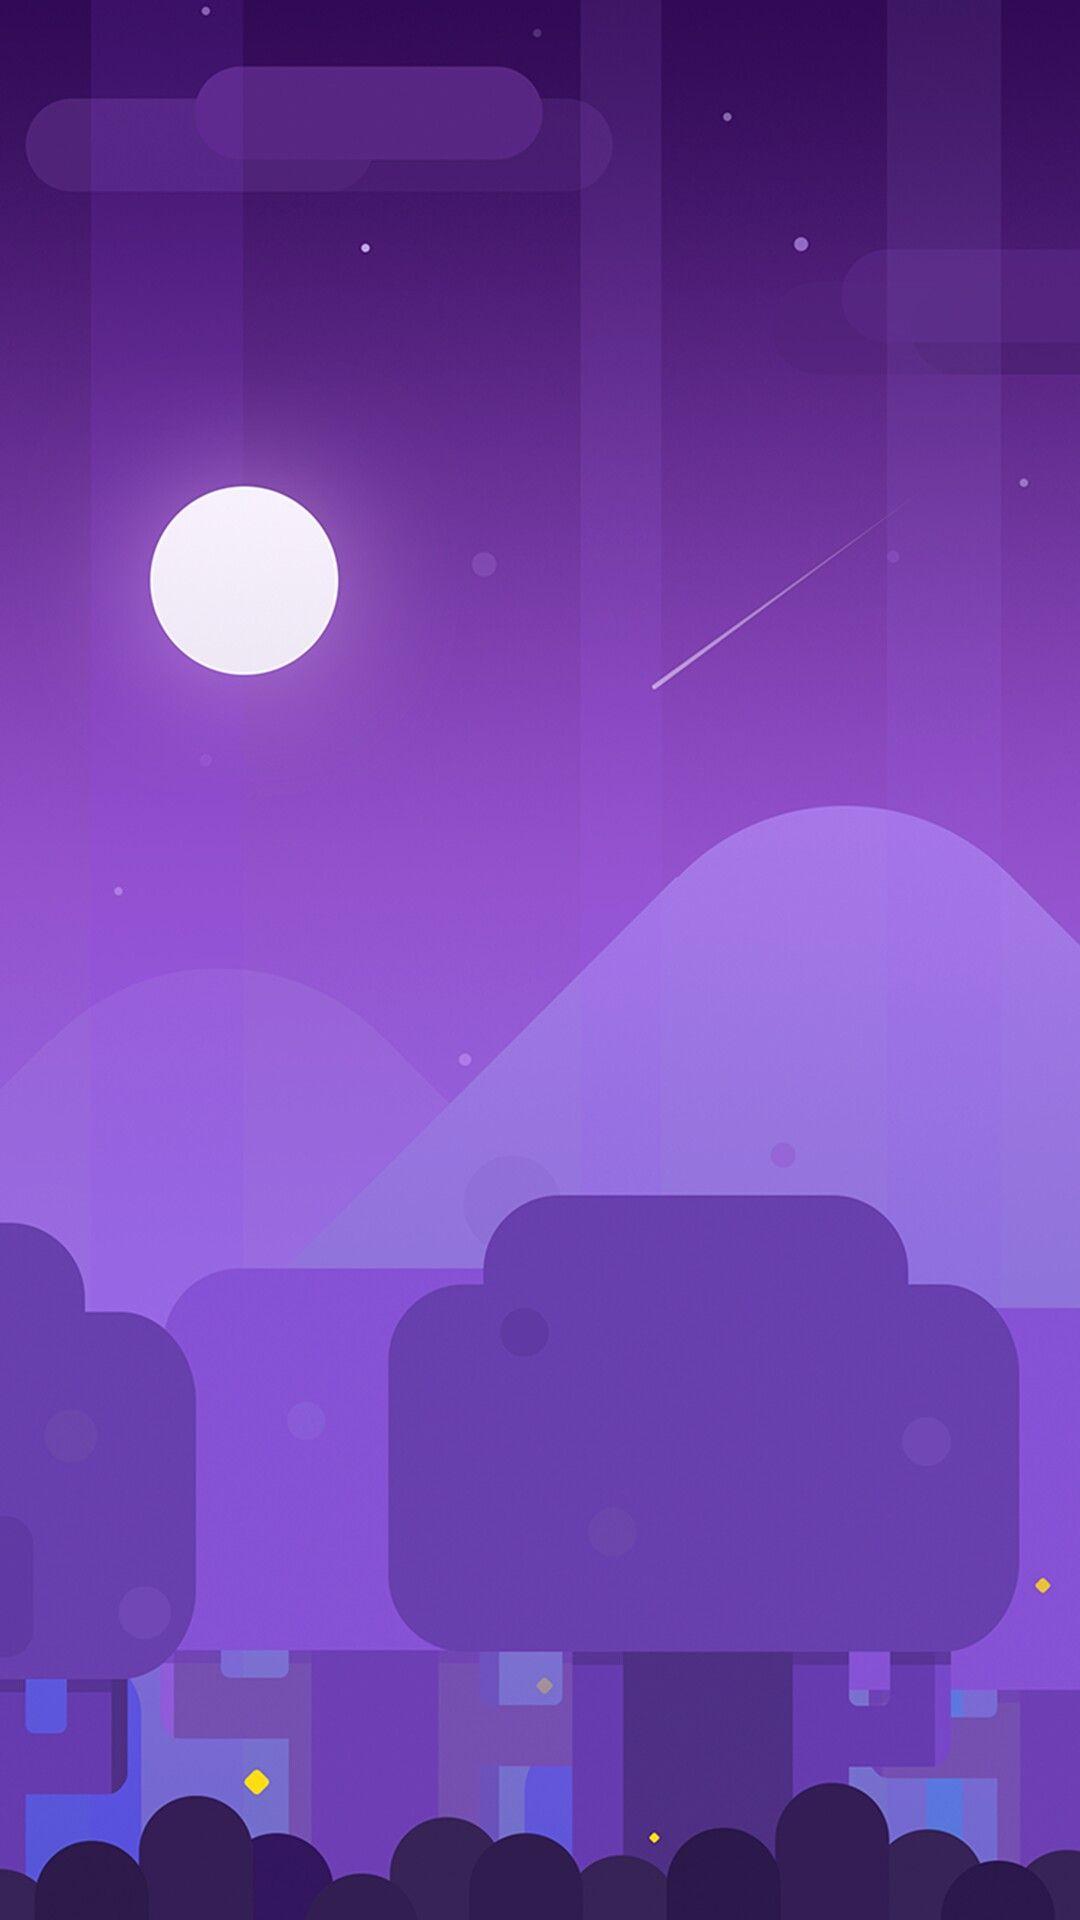 Minimalist Purple Wallpapers   Top Minimalist Purple 1080x1920